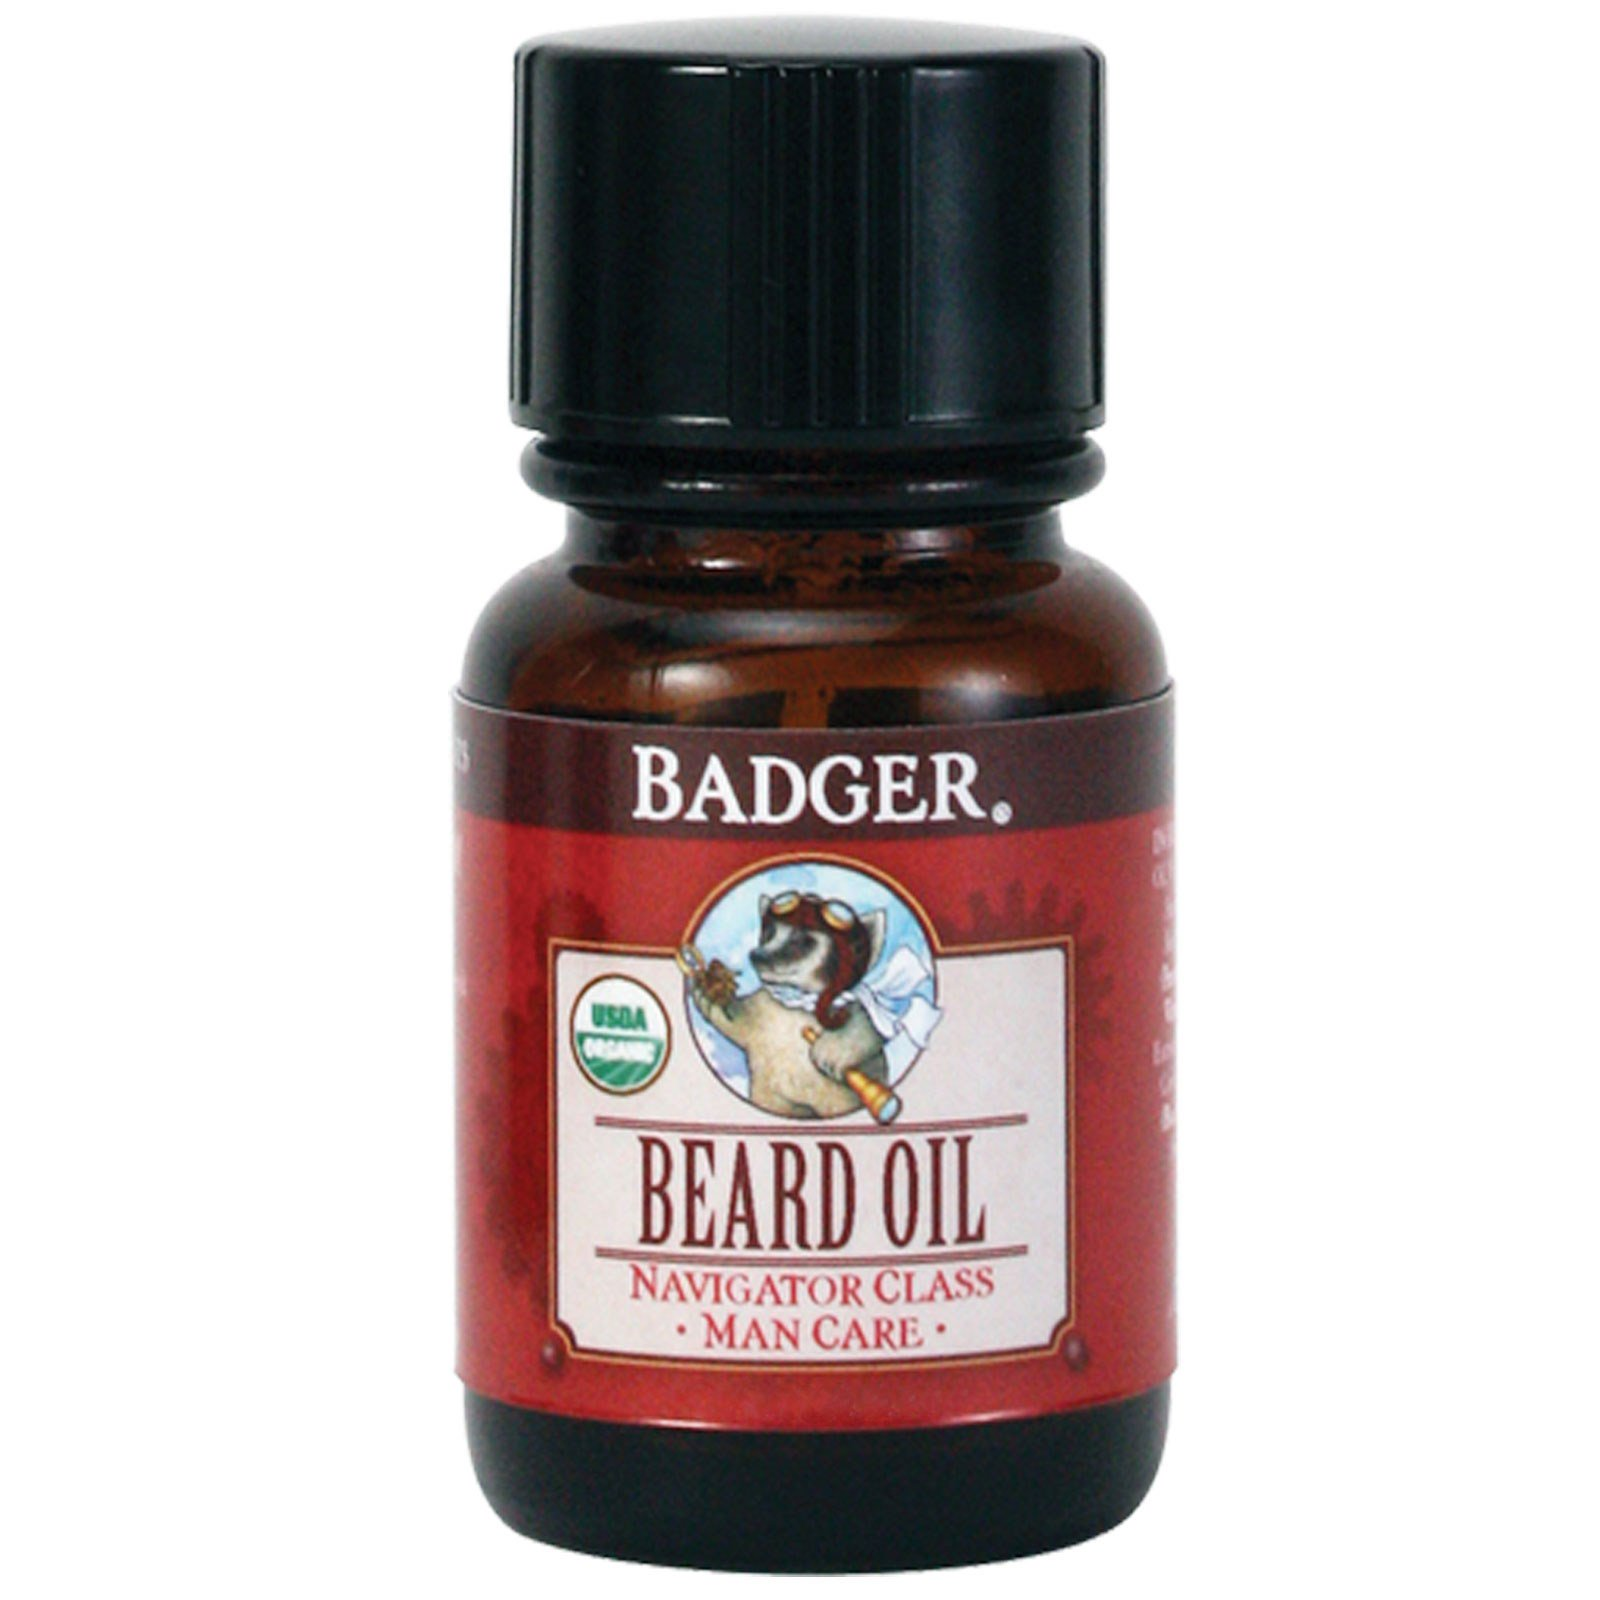 Badger Company, Масло для бороды, Navigator Class, уход для мужчин, 1 жидкая унция (29,6 мл)